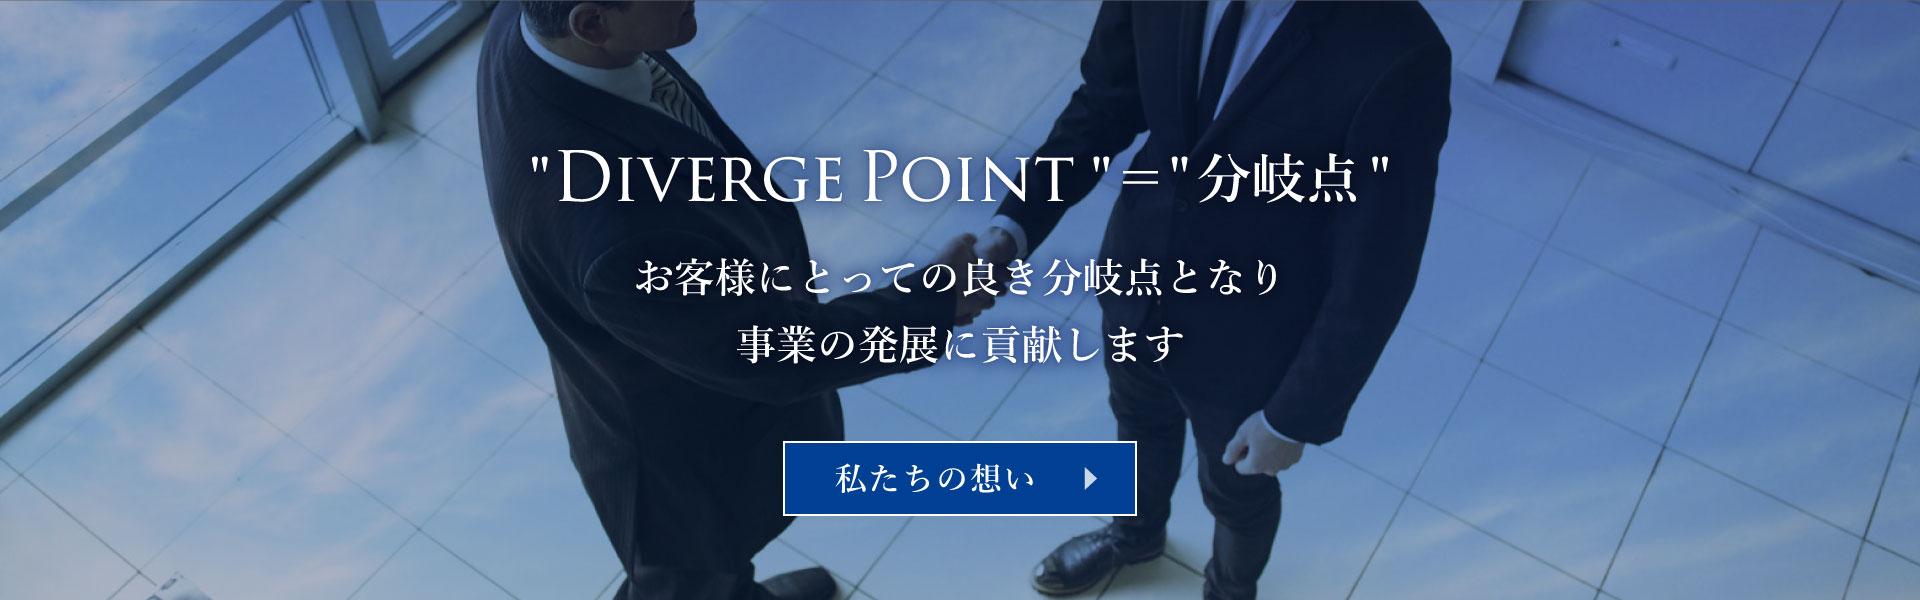 """Diverge Point""=""分岐点"" お客様にとっての良き分岐点となり 事業の発展に貢献します"